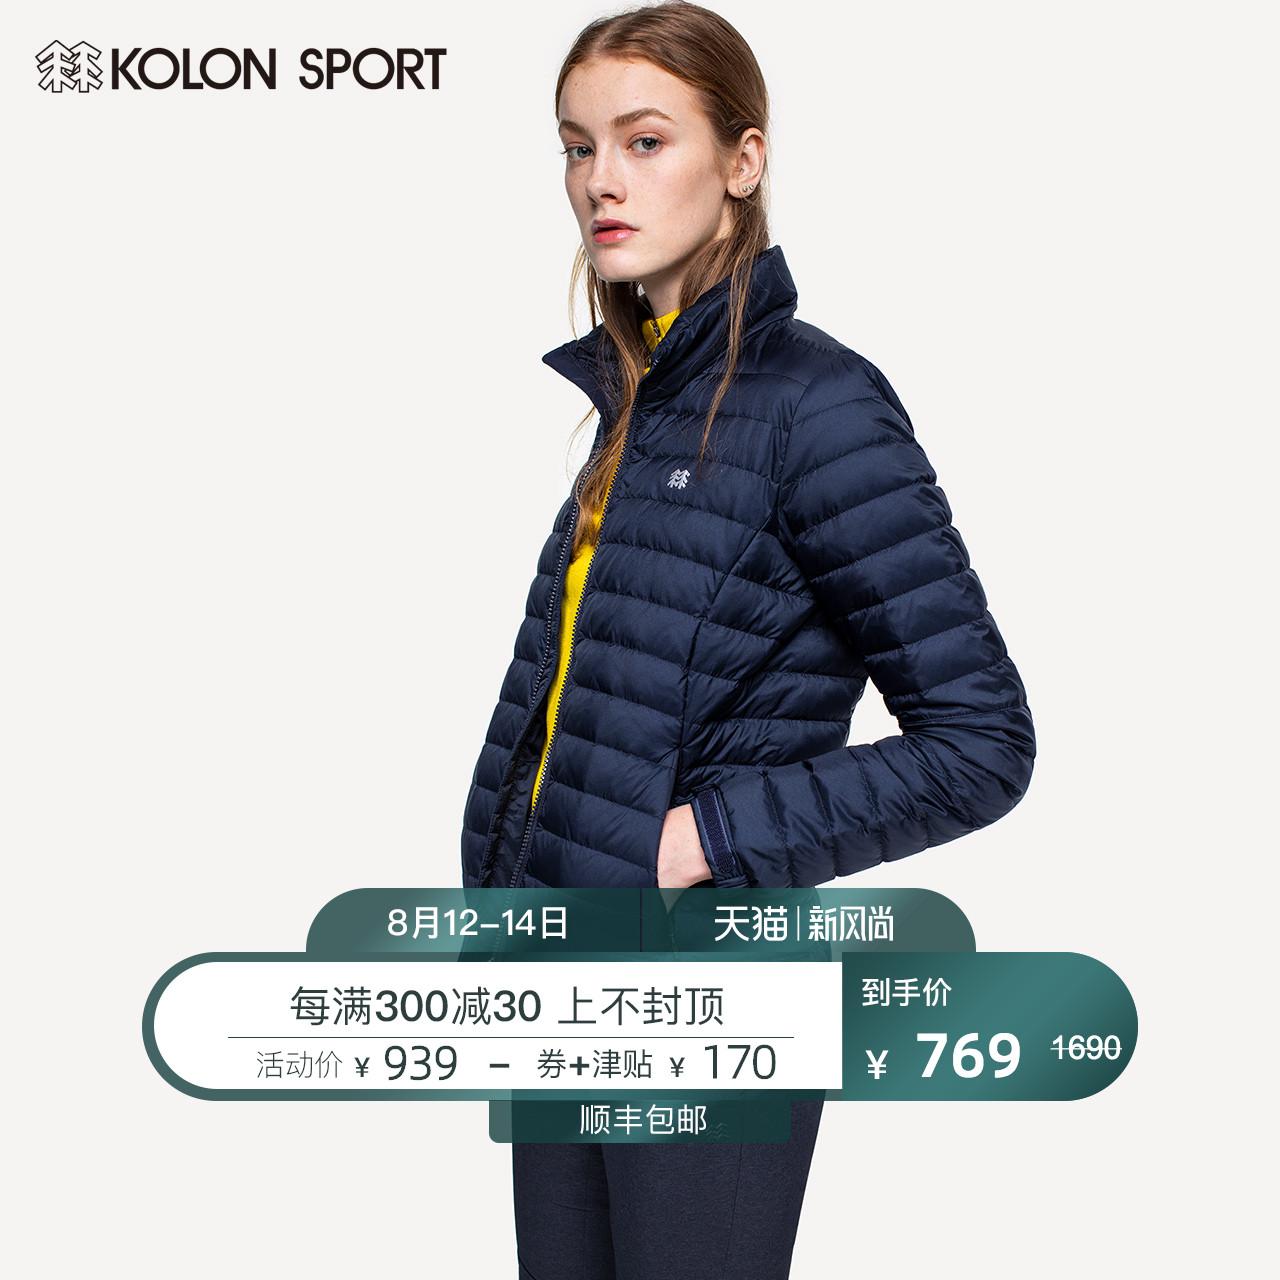 KOLONSPORT可隆轻薄羽绒服女短款立领时尚韩版修身轻量鹅绒羽绒服